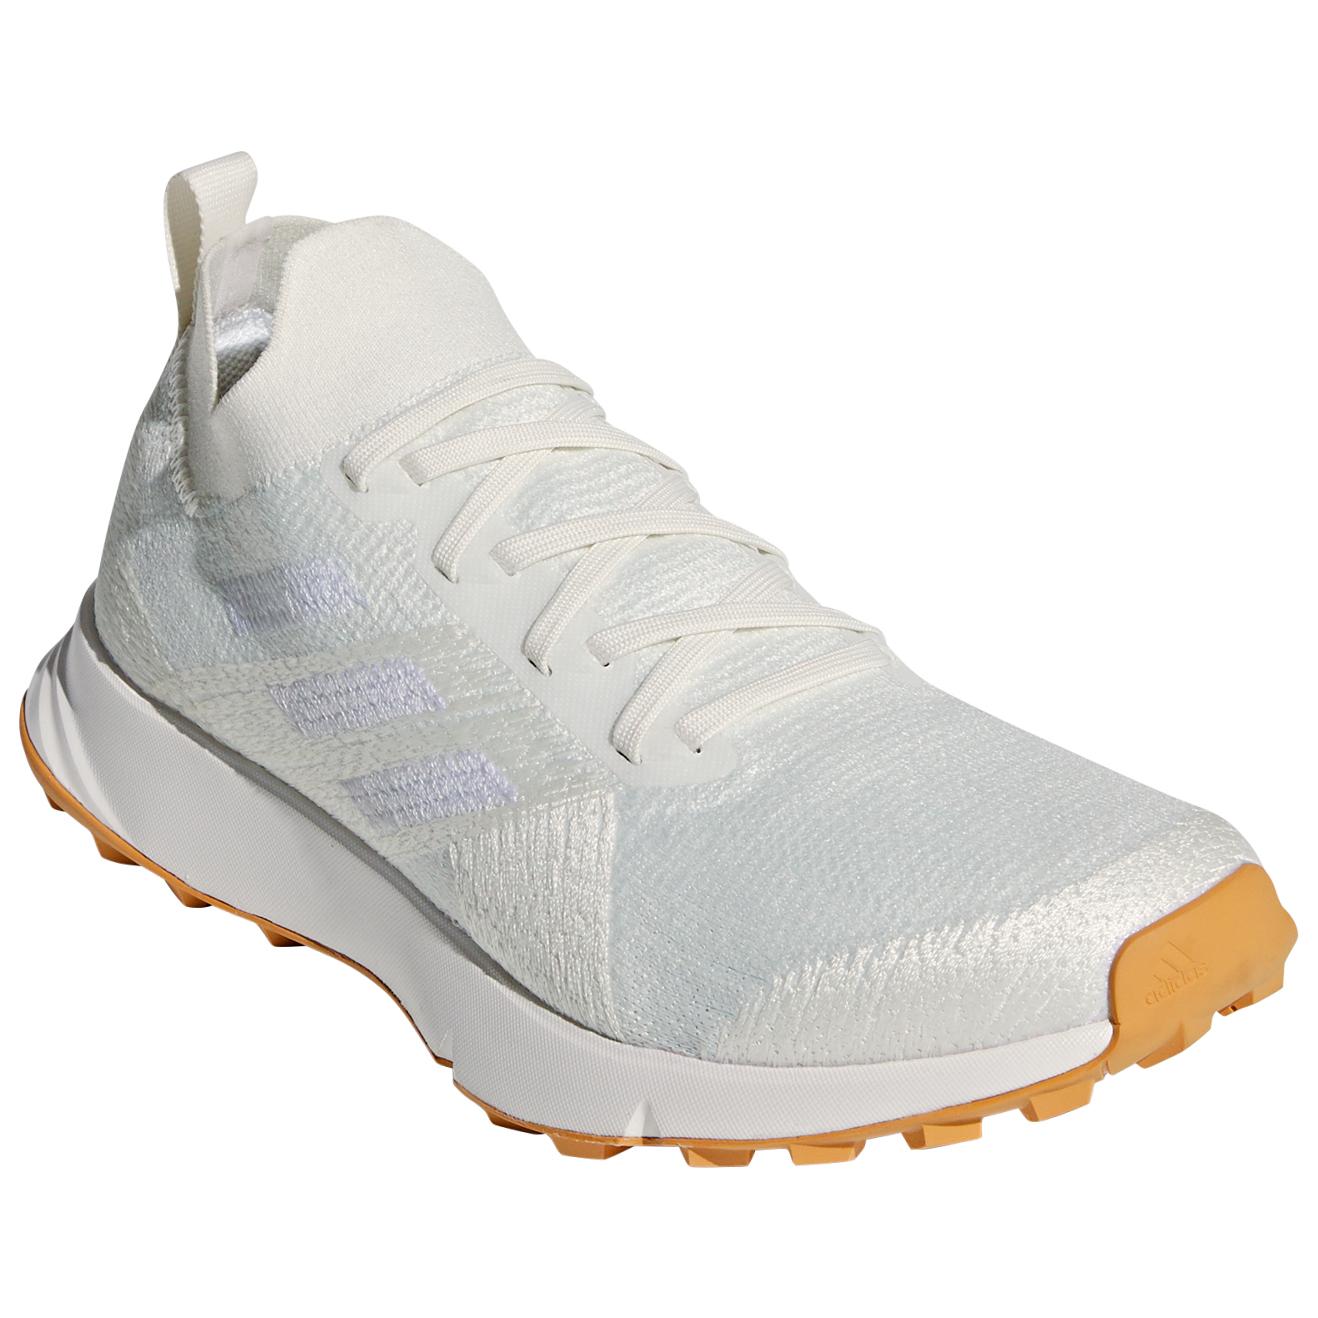 Adidas Terrex Two Parley Trailrunningsko Dame køb online